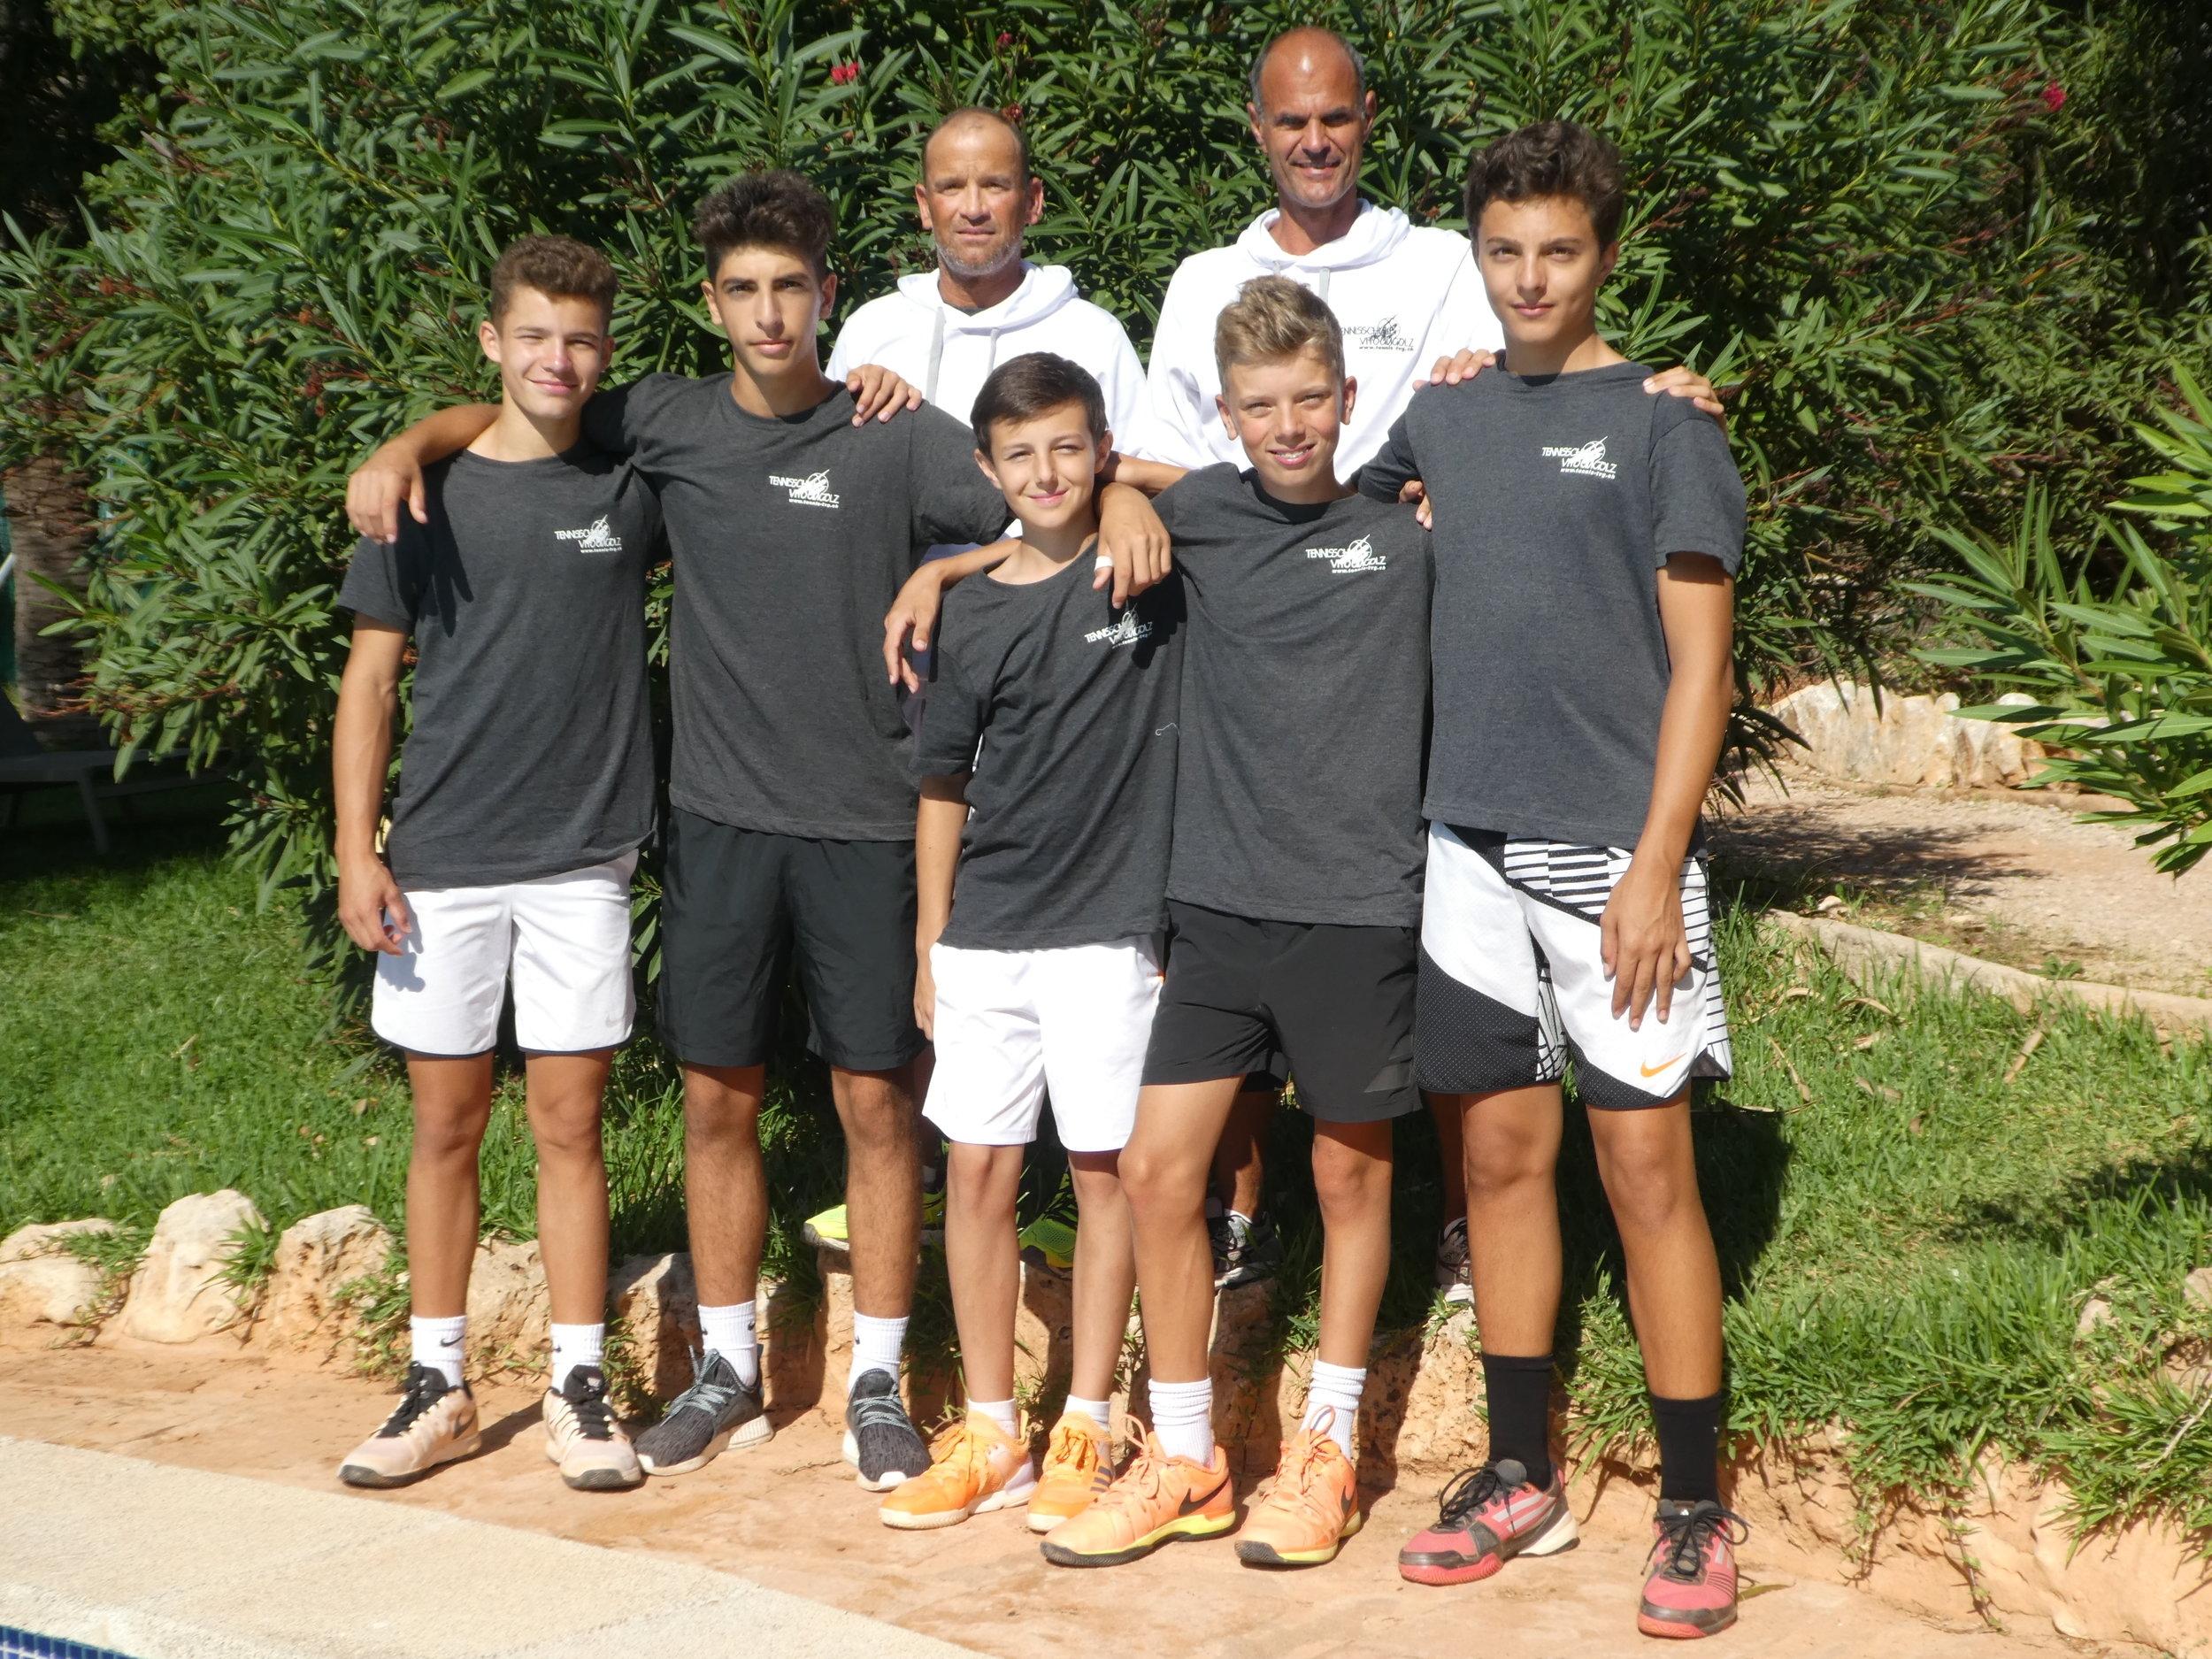 BLTC U15 (vlnr): Georg Stettler, Onur Isik, Mika Perrin, Noël Zellweger, Sacha Gugolz; hinten die Trainer: Andy Kunz, Vito Gugolz